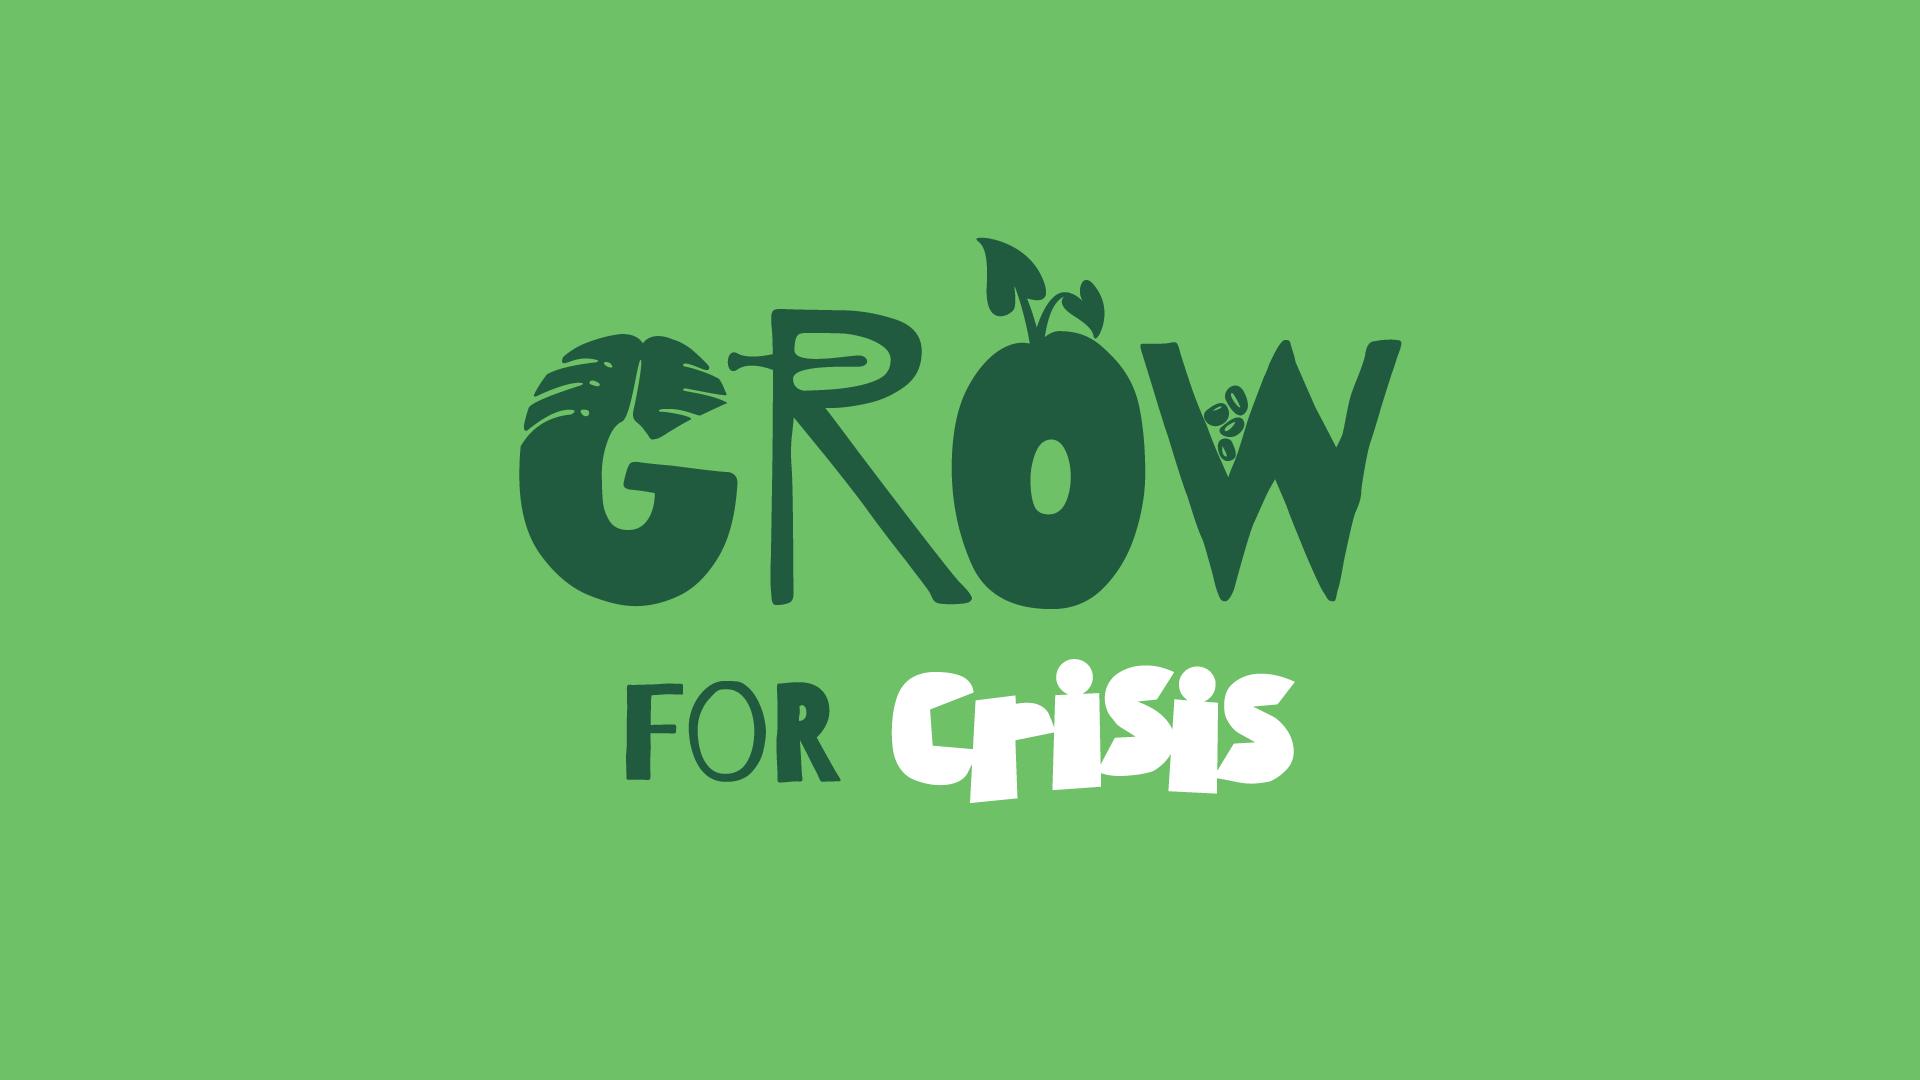 Grow for crisis logo